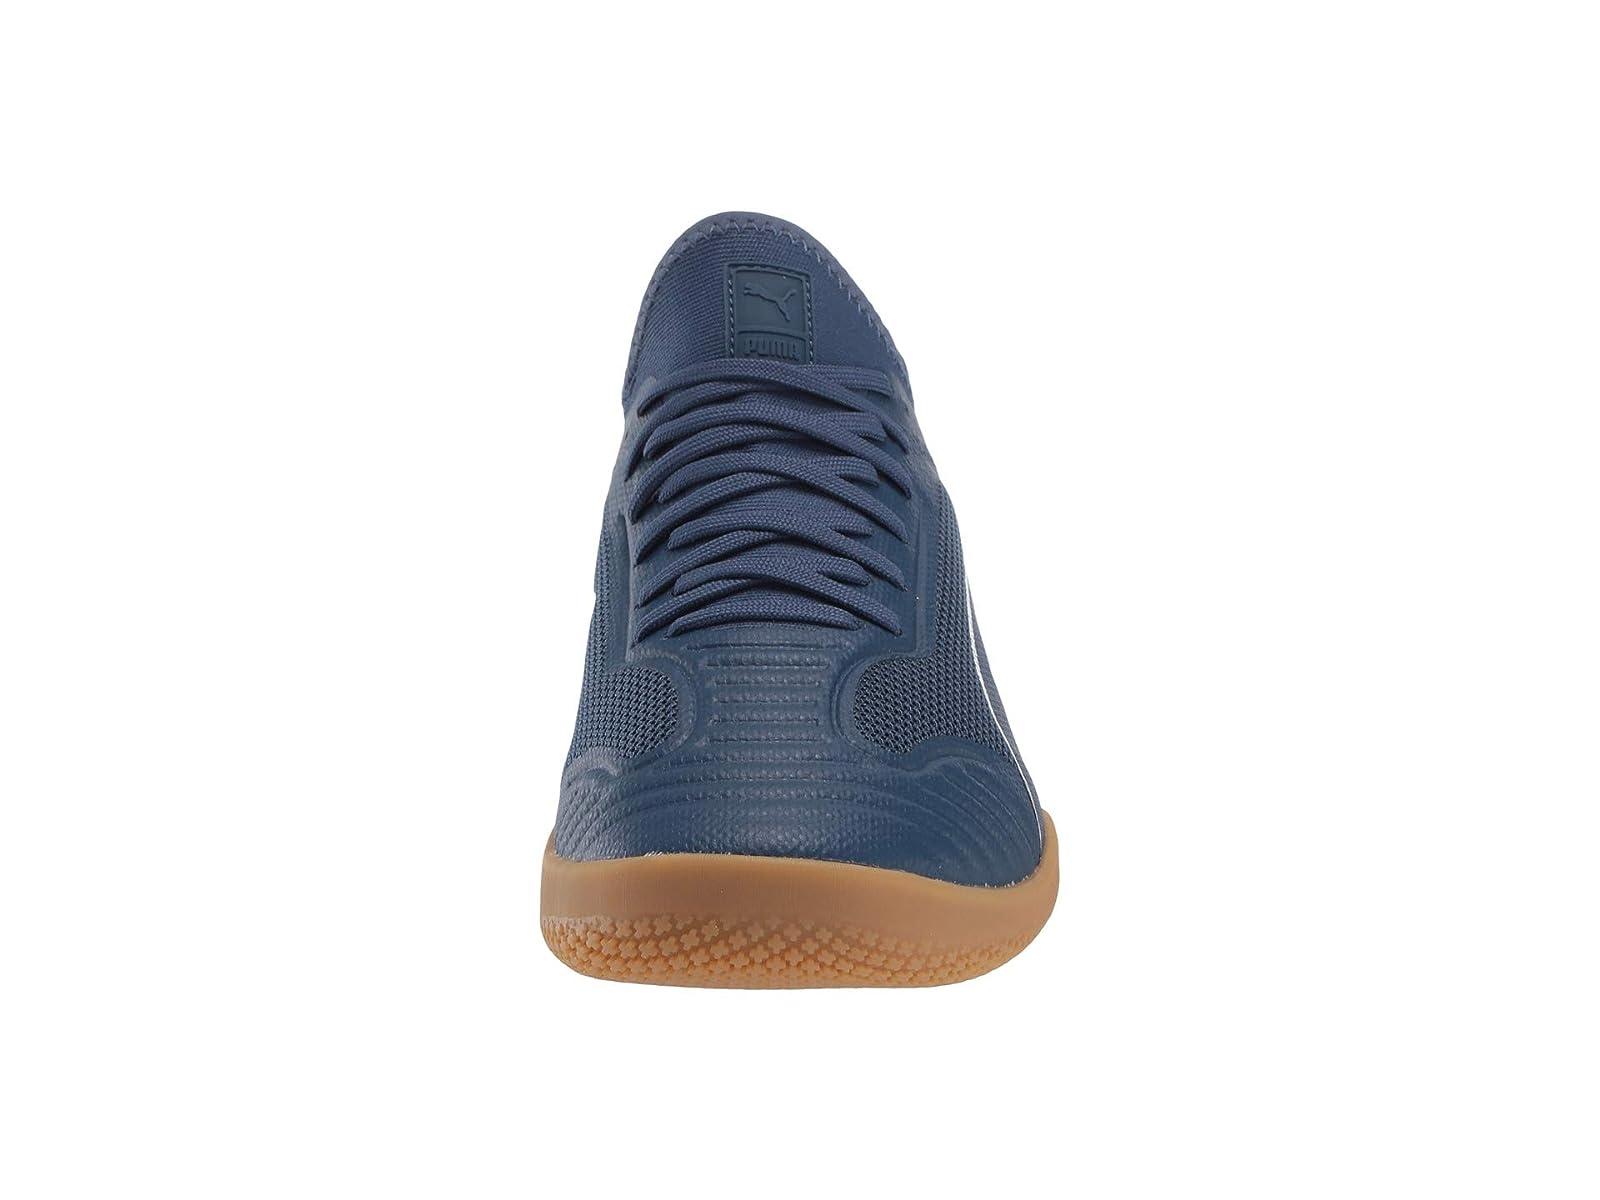 Man-039-s-Sneakers-amp-Athletic-Shoes-PUMA-365-Sala-1 thumbnail 8